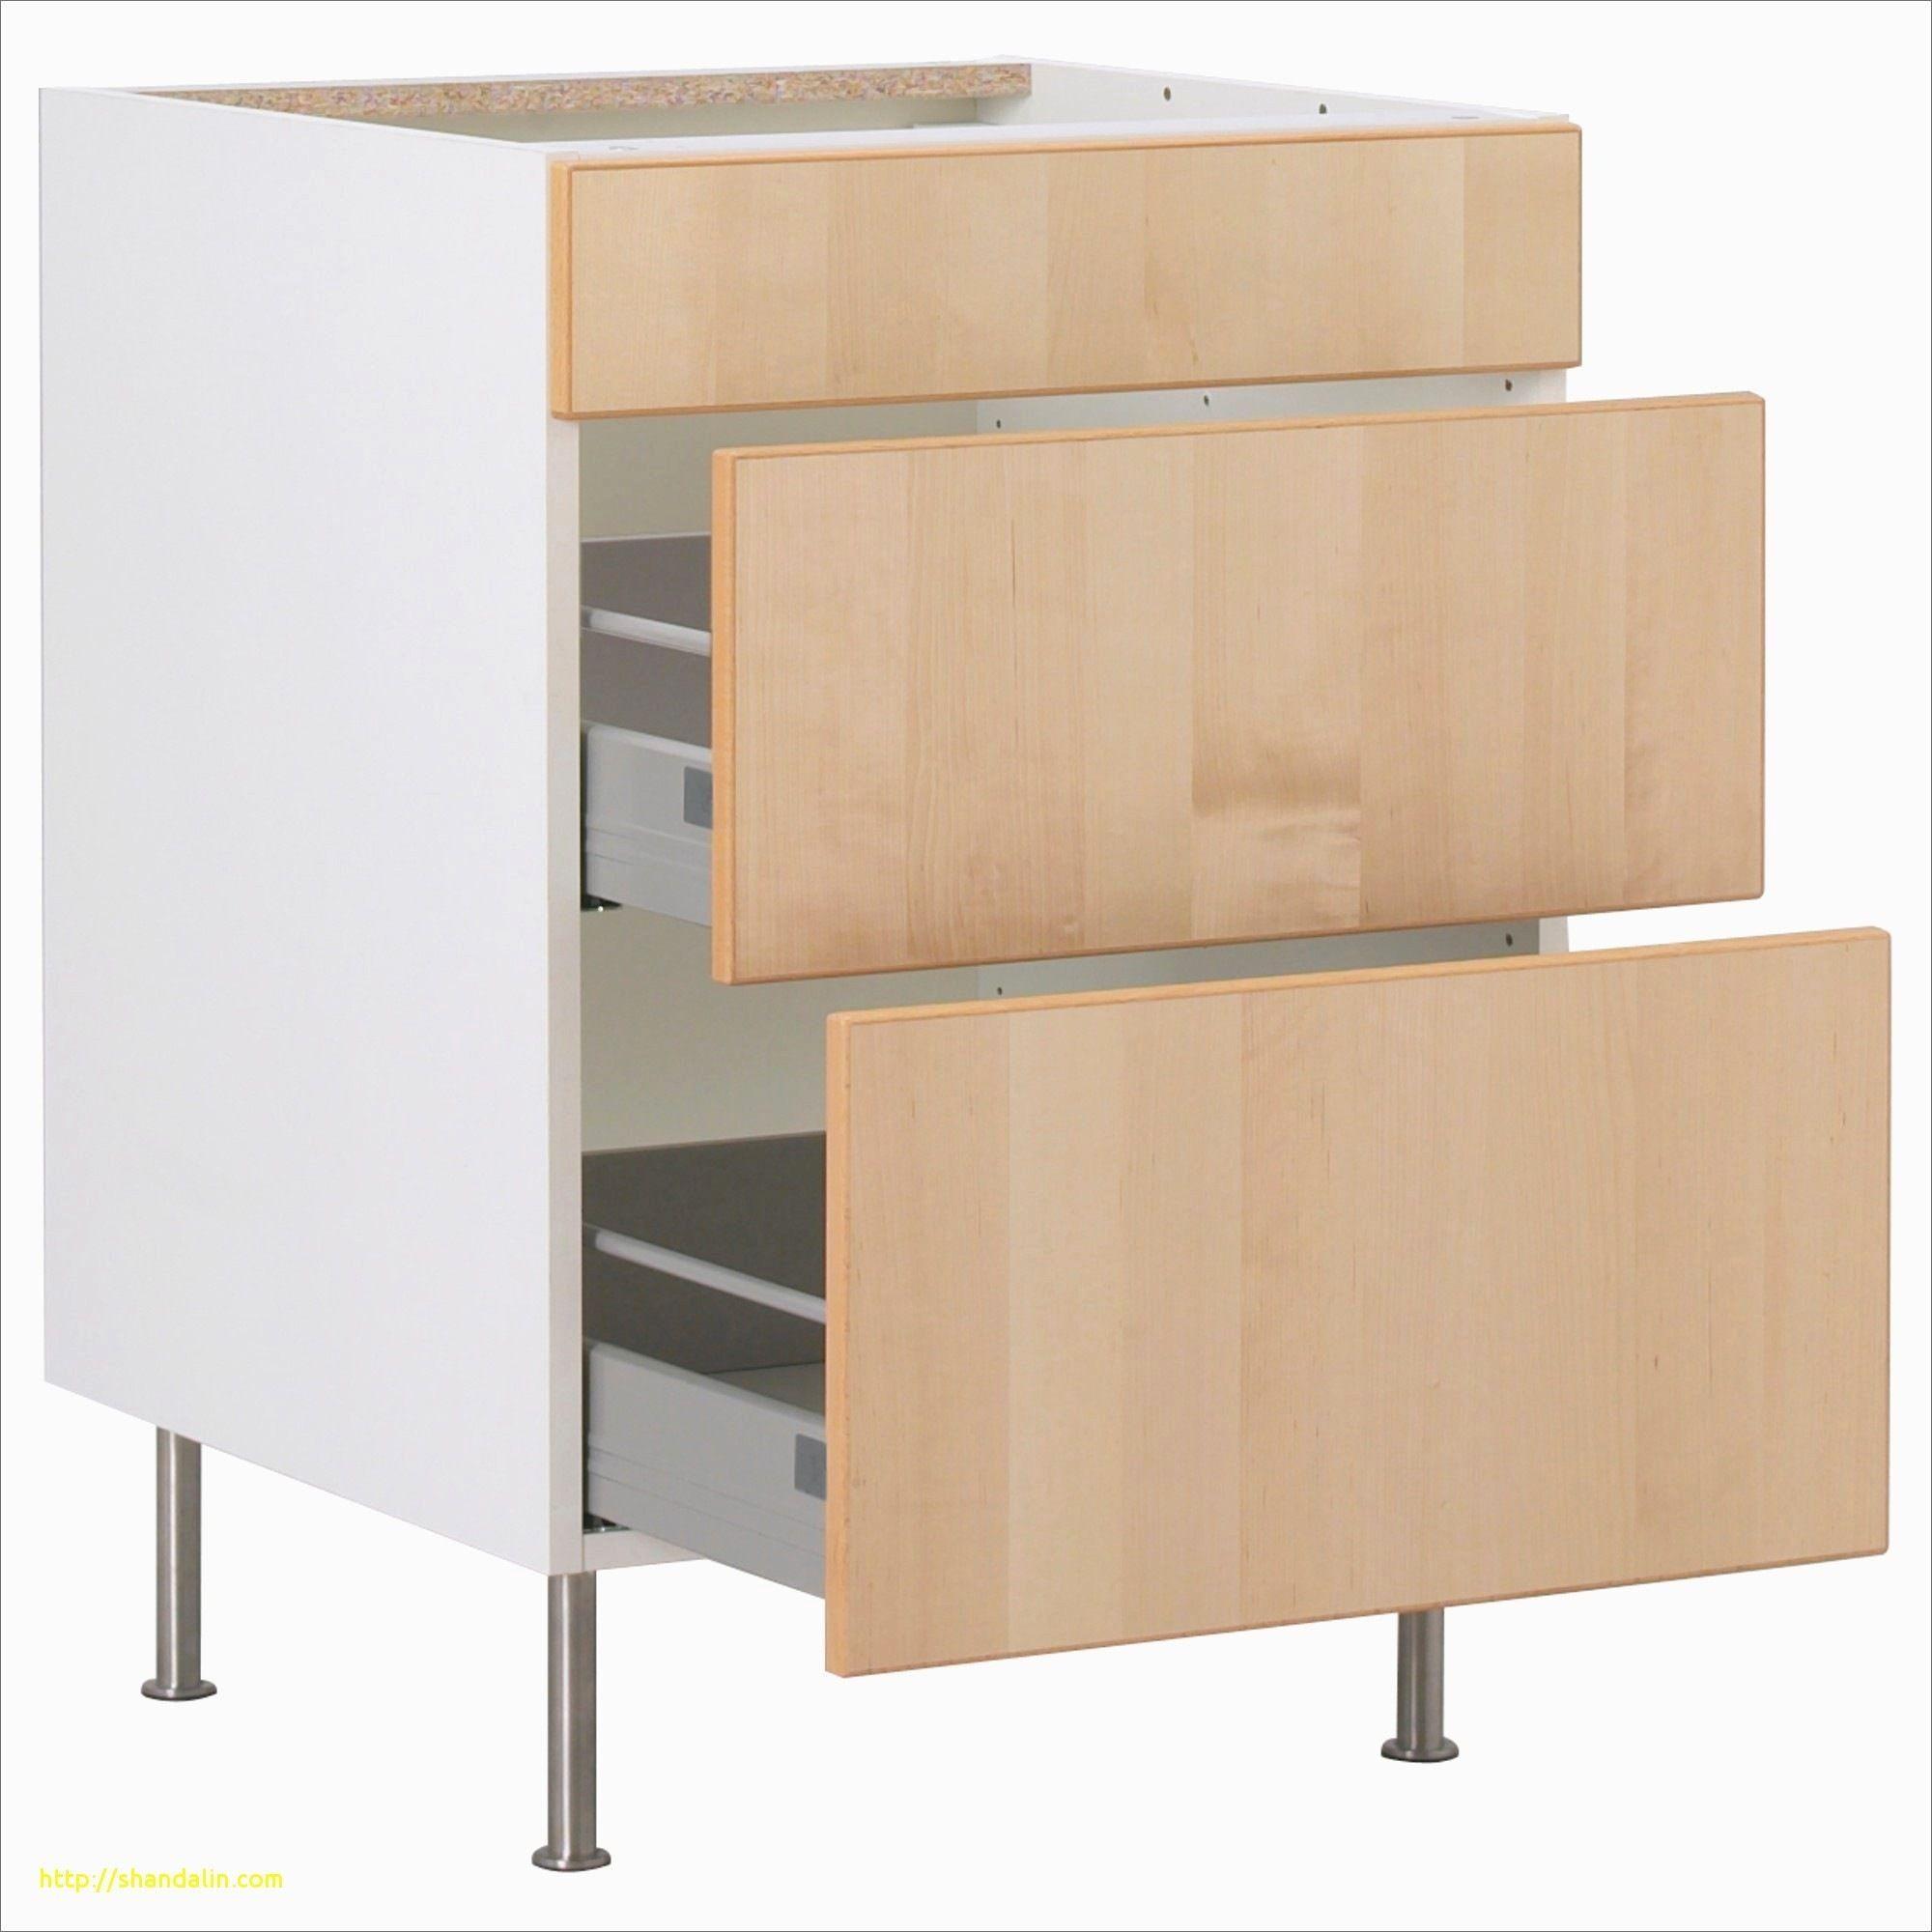 Meuble 50 Cm De Large Ideas Meuble Cuisine Meuble De Cuisine Ikea Meuble Bas